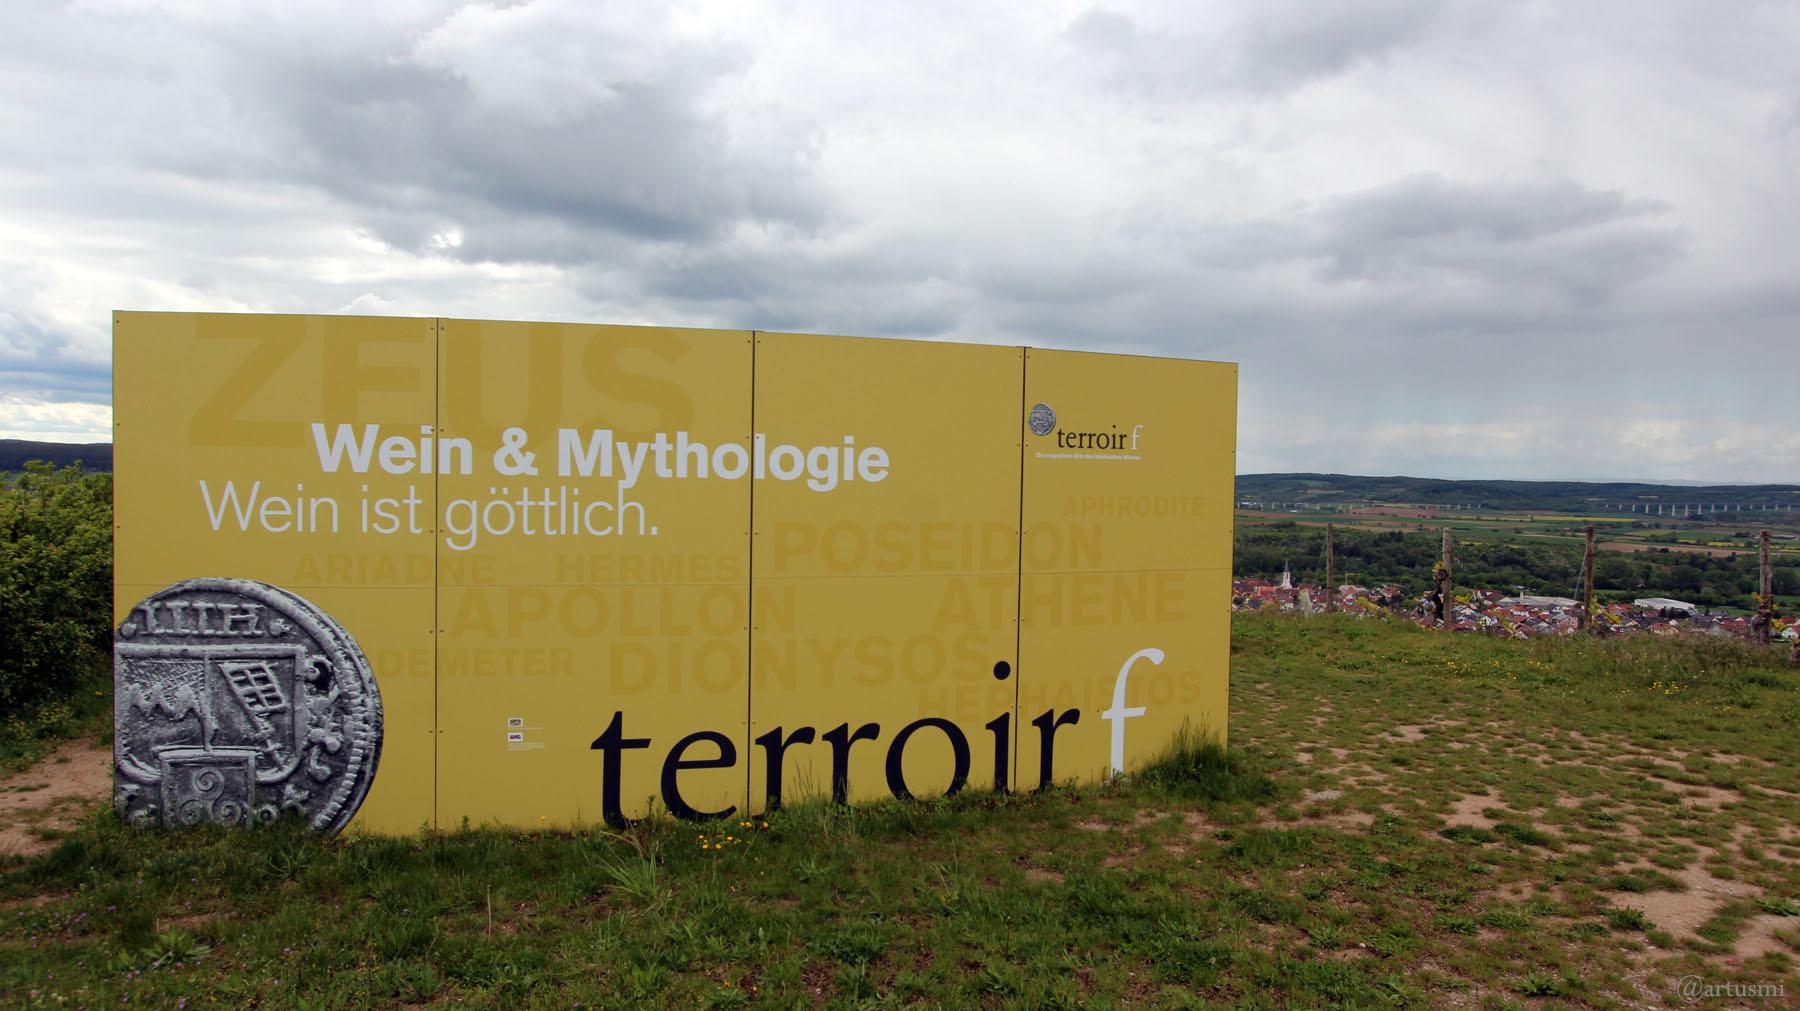 terroir f Thüngersheim - Wein & Mythologie